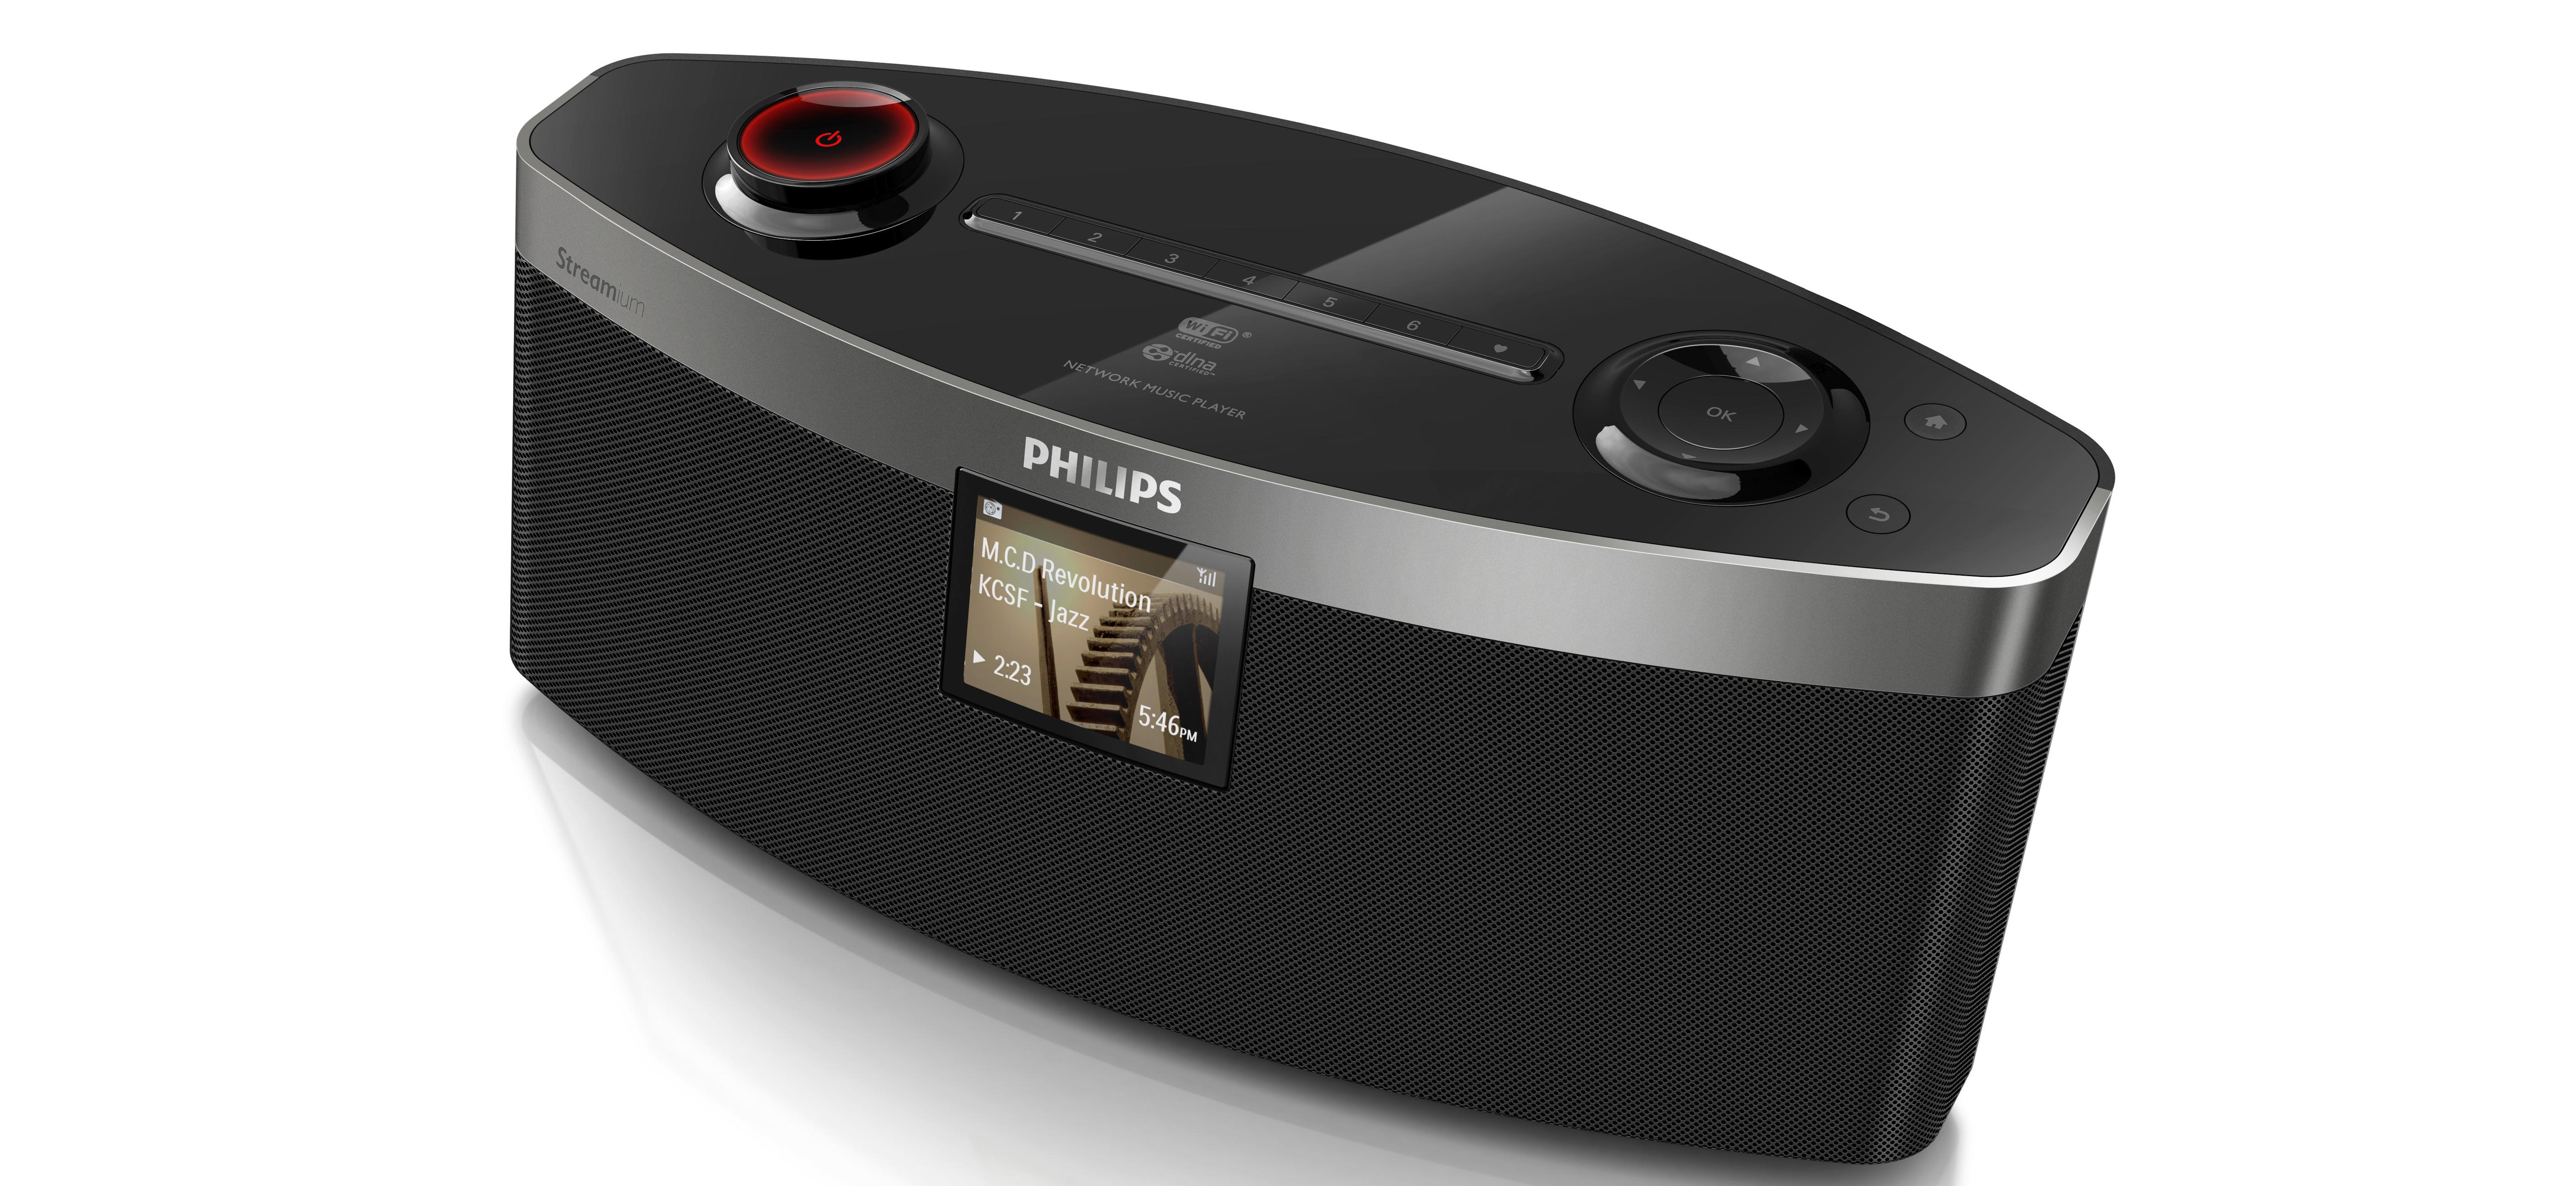 Philips Streamium NP3300